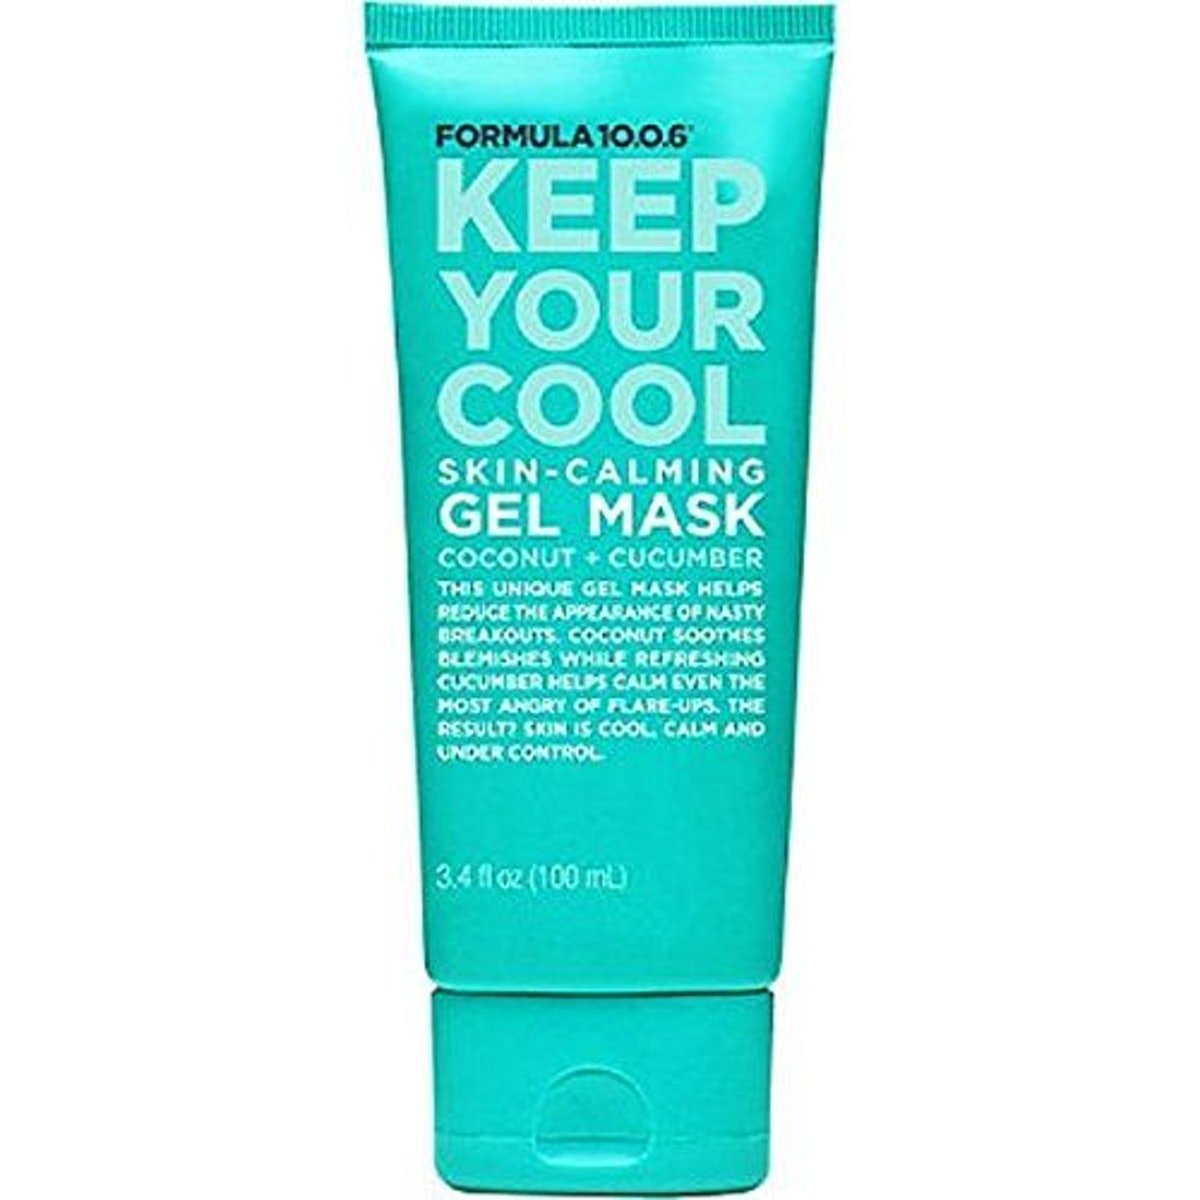 Keep Your Cool Skin-Calm Gel Mask